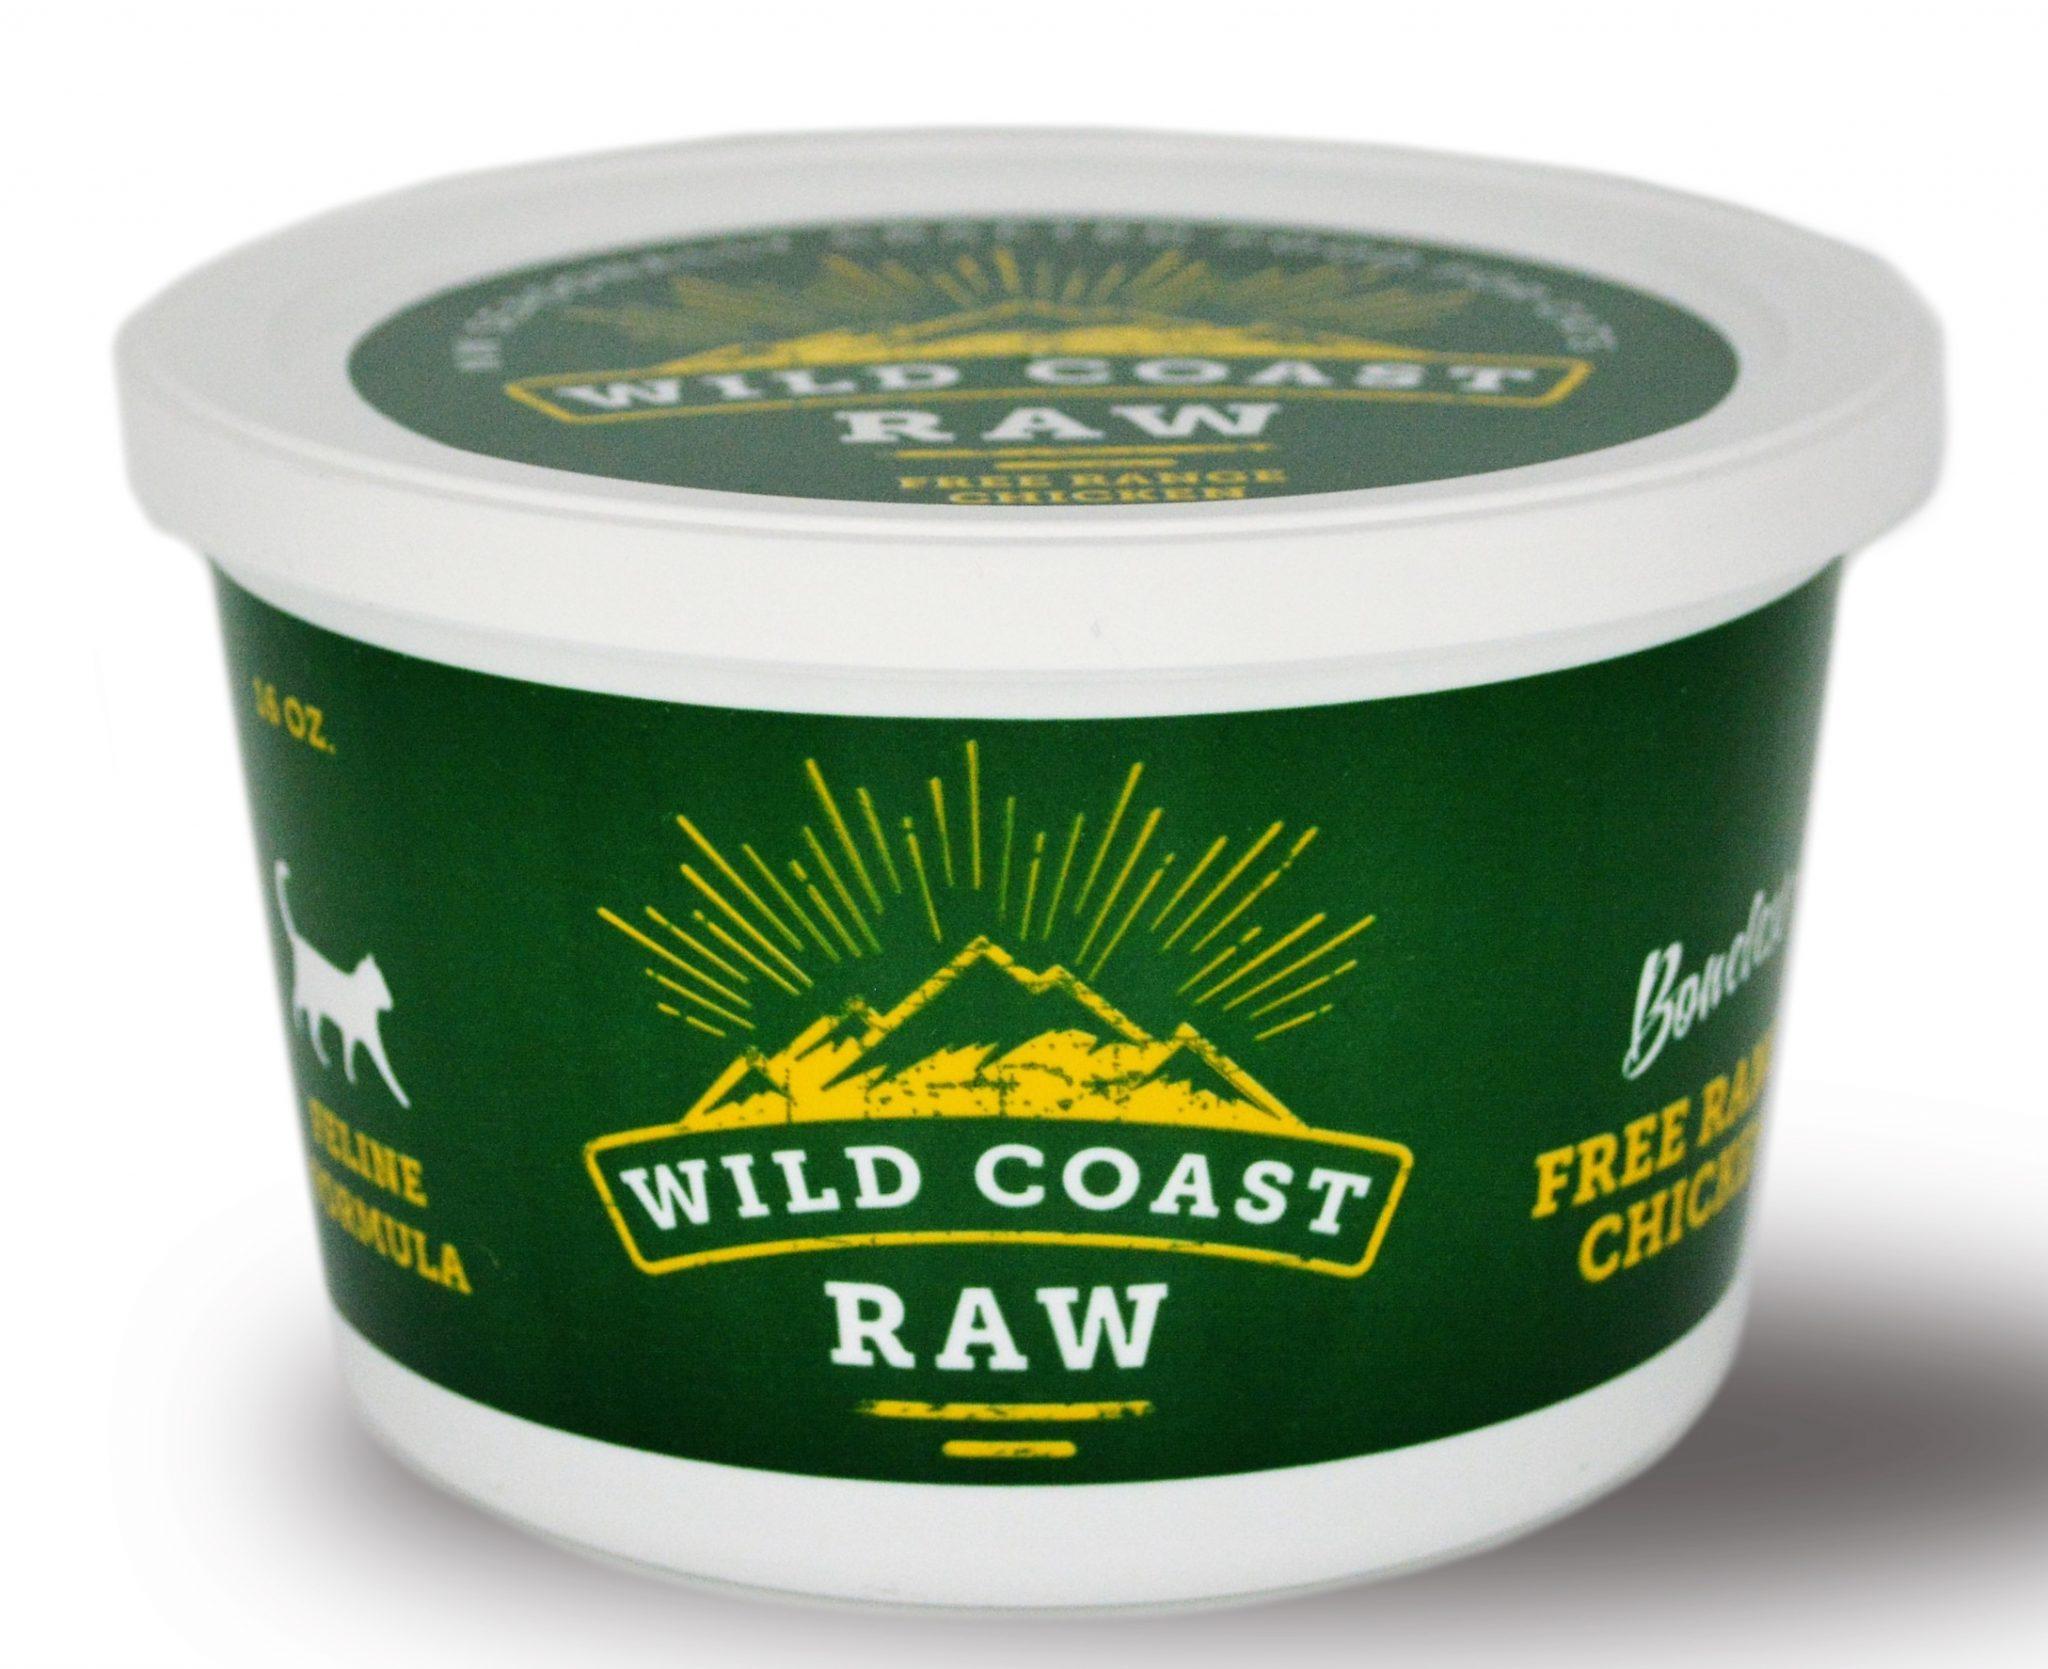 Wild Coast Raw Free Range Chicken Raw Frozen Cat Food, 1-lb